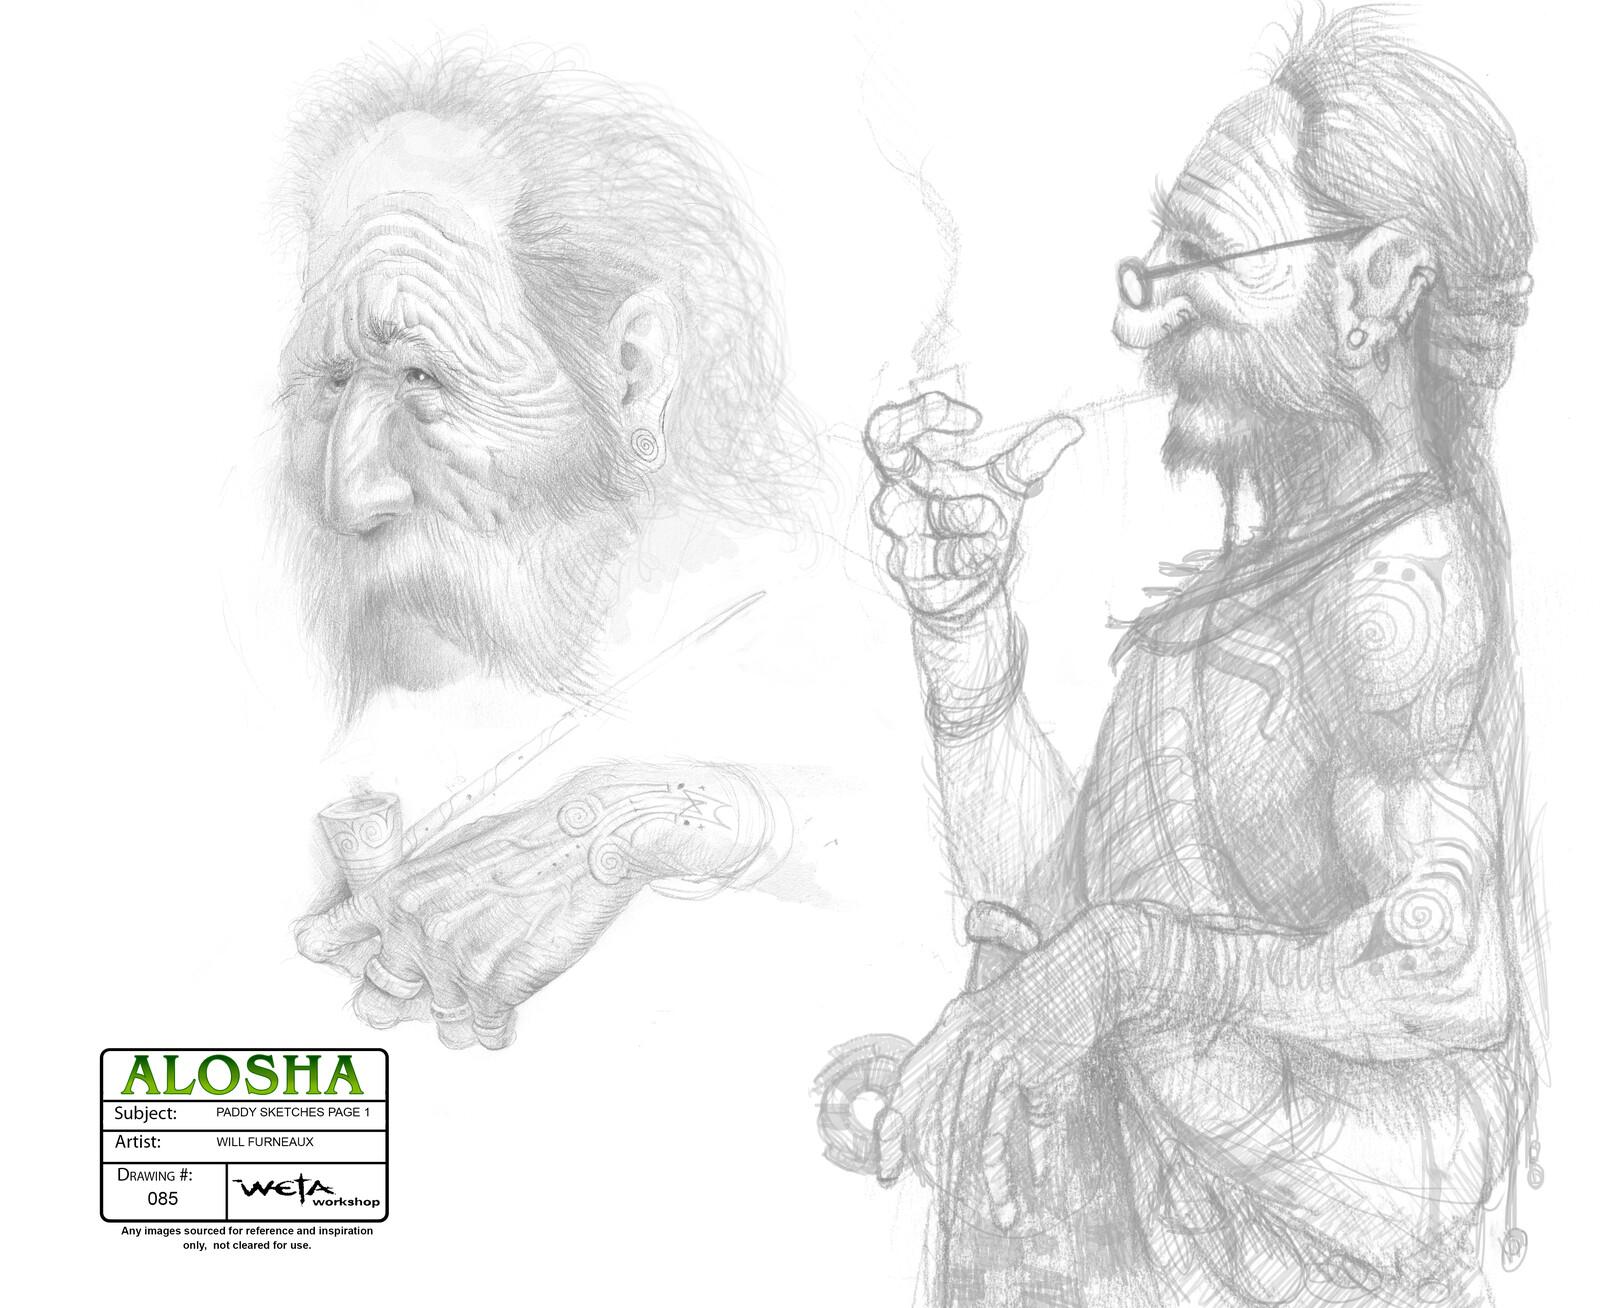 Alosha - Paddy concepts